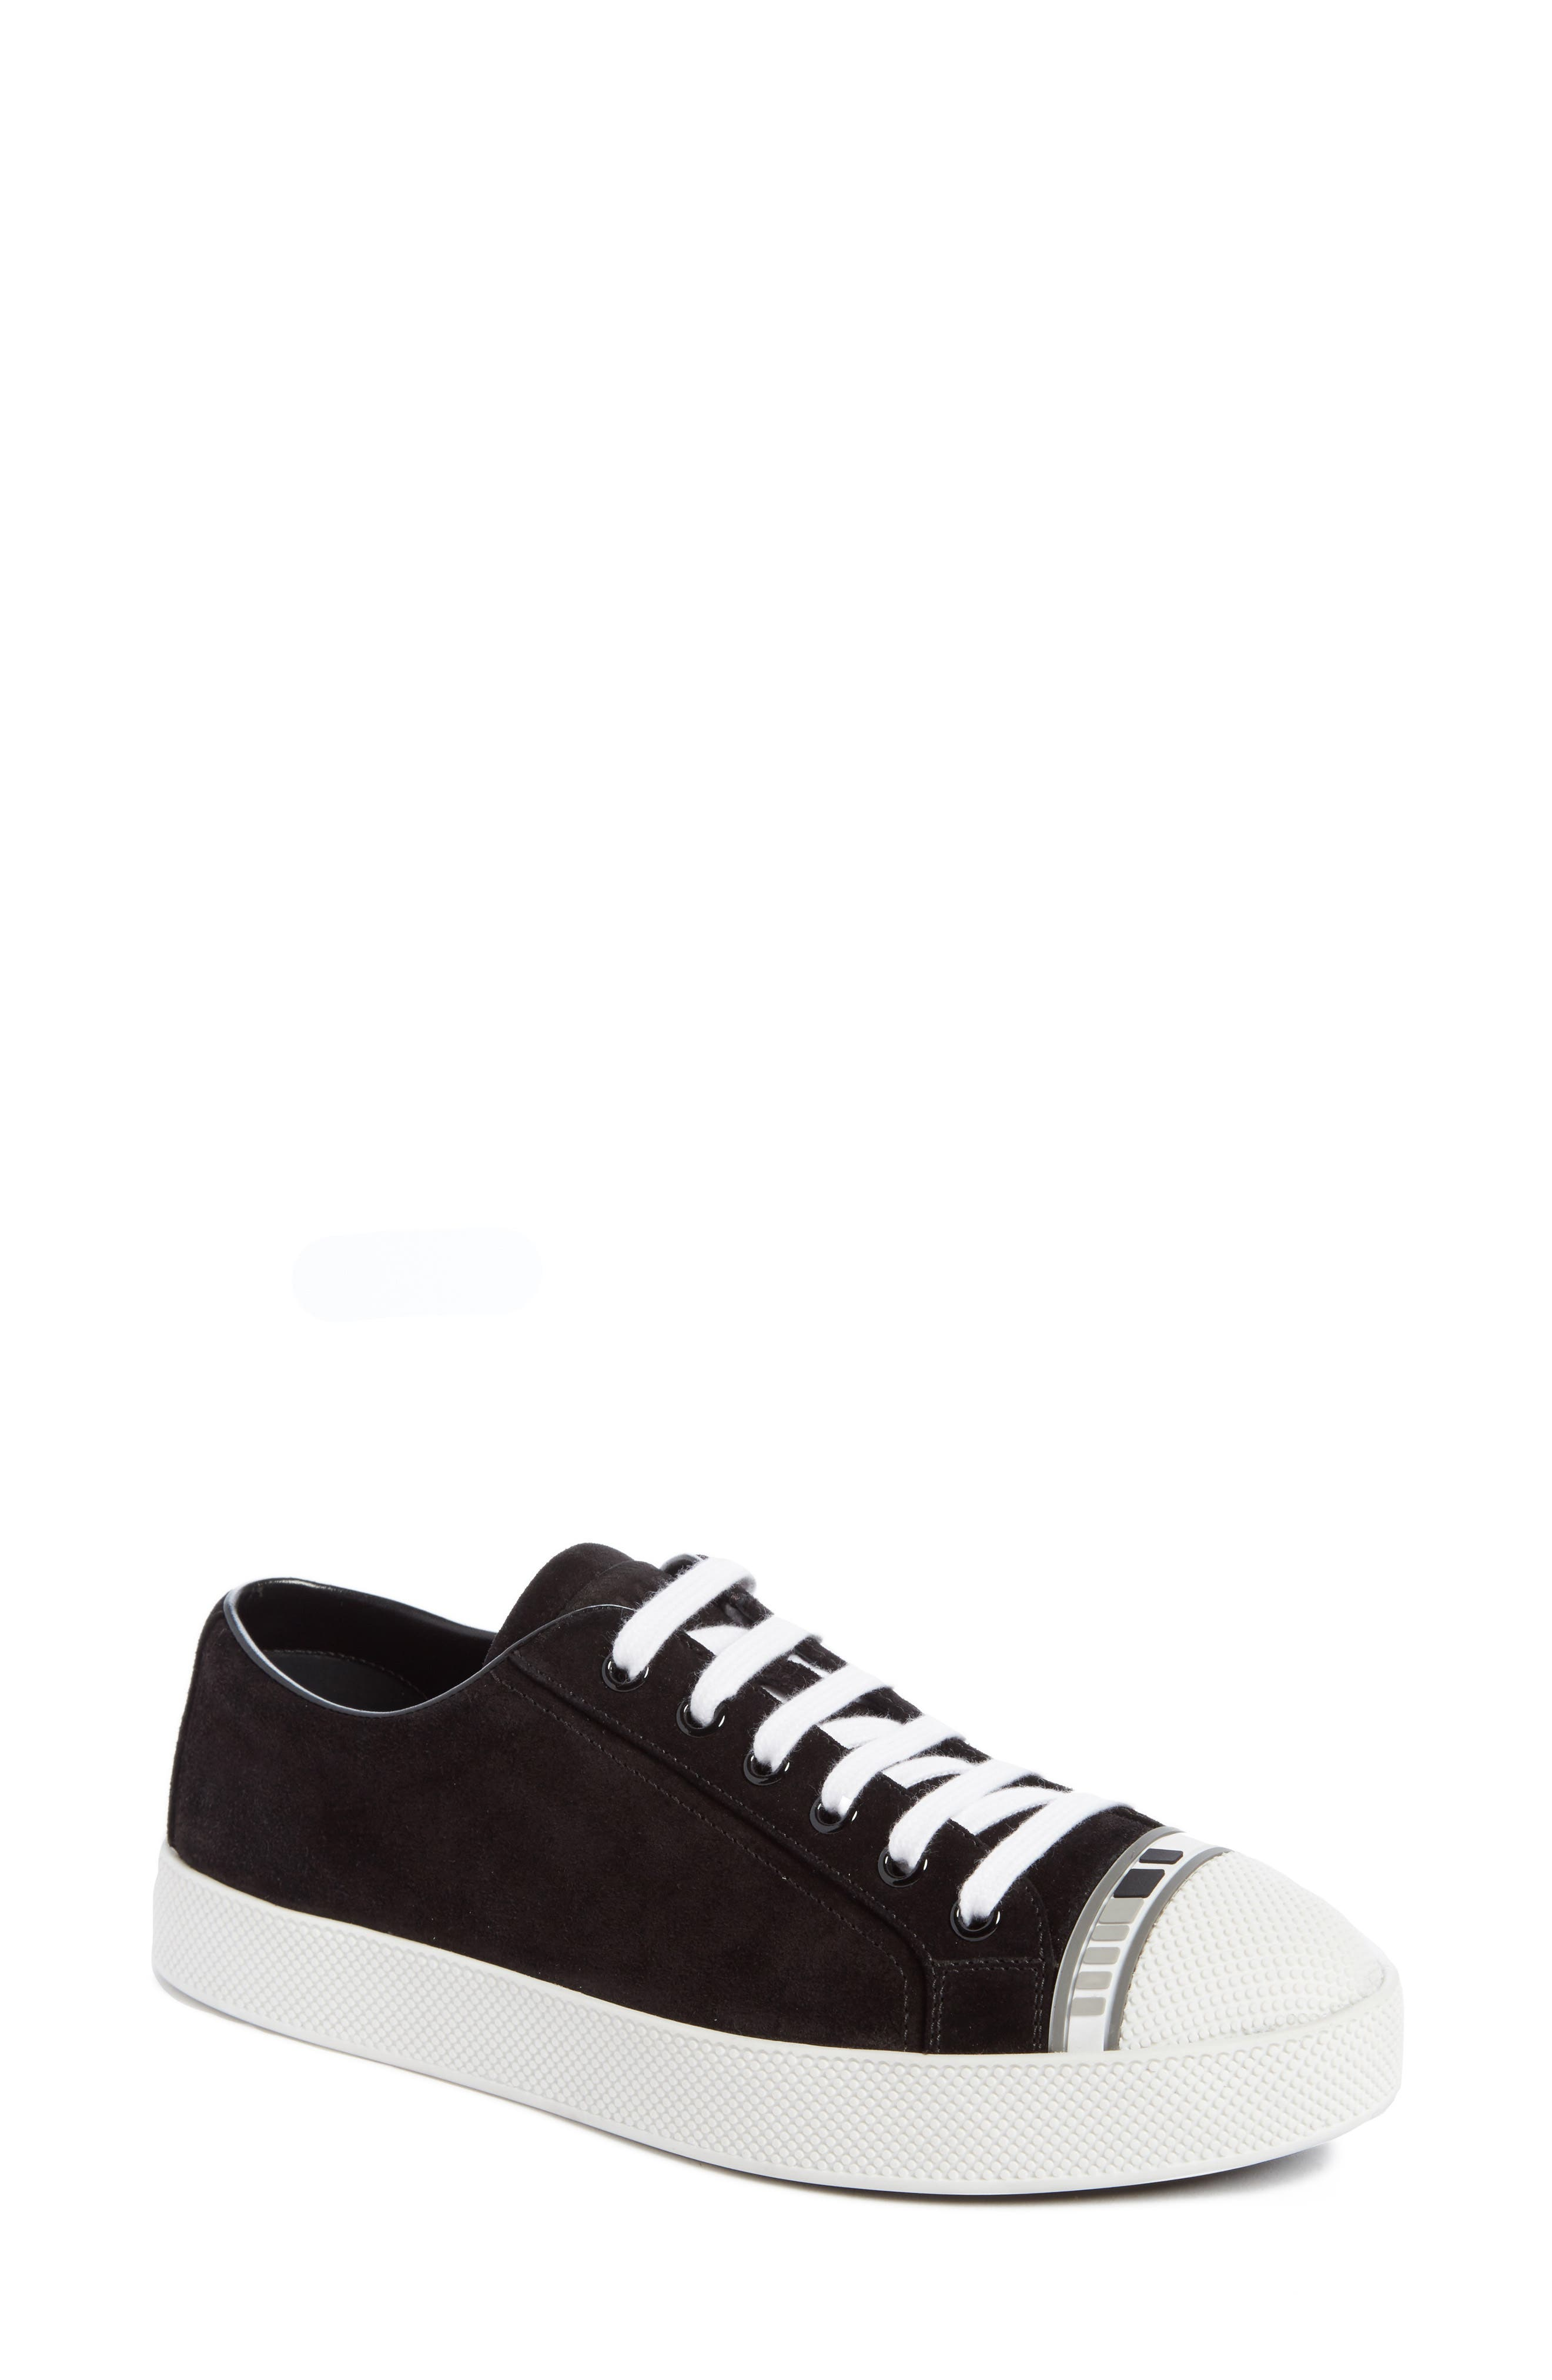 Main Image - Prada Linea Rossa Logo Platform Sneaker (Women)